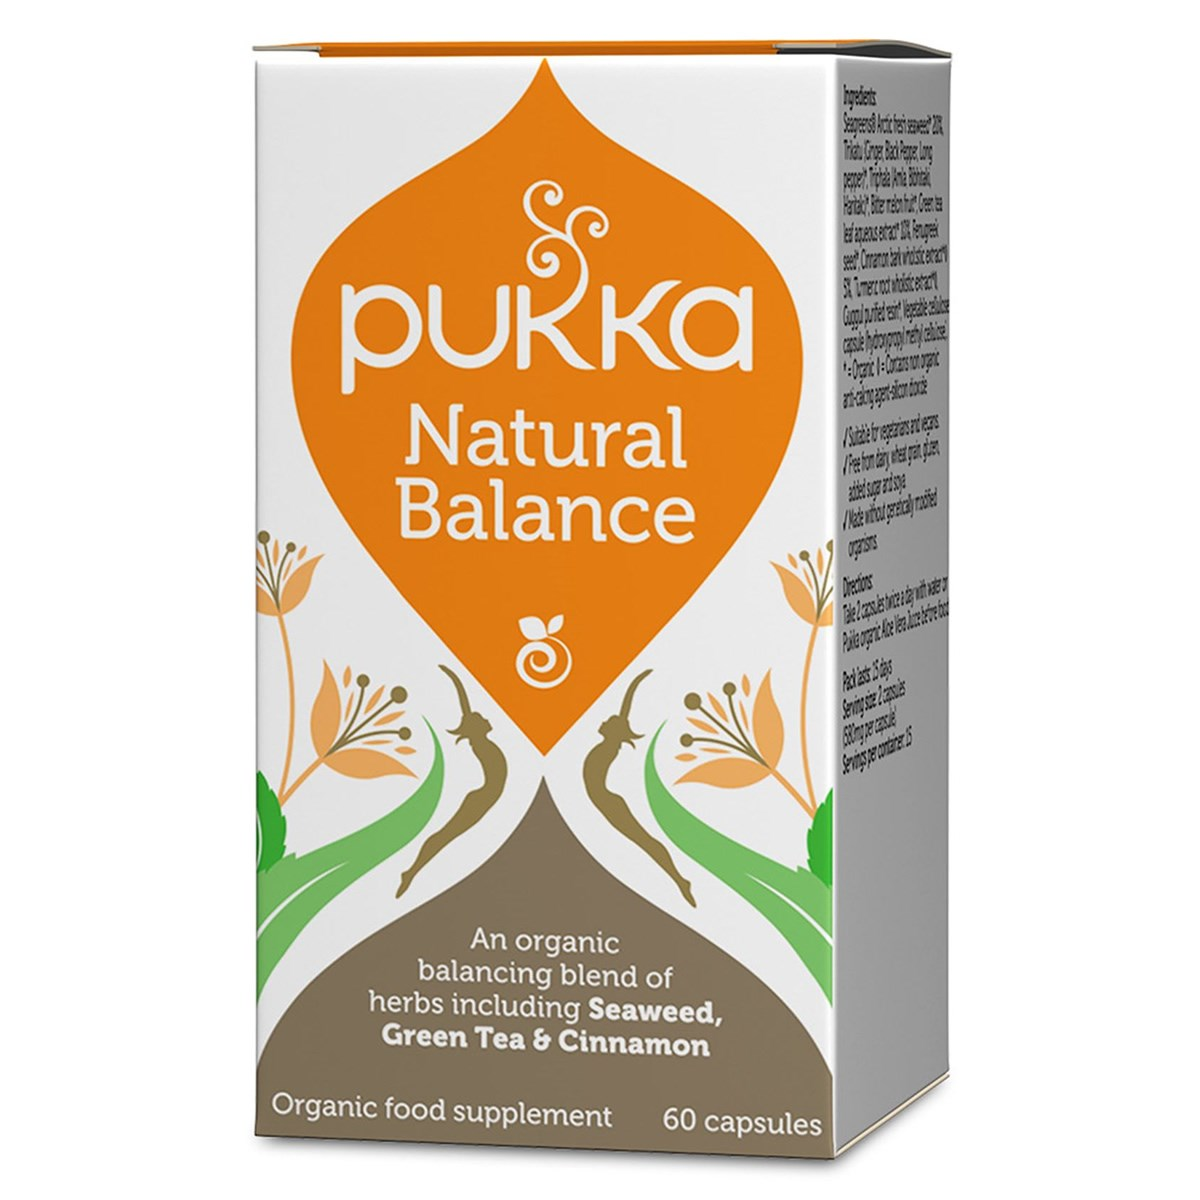 Pukka Natural Balance Capsules